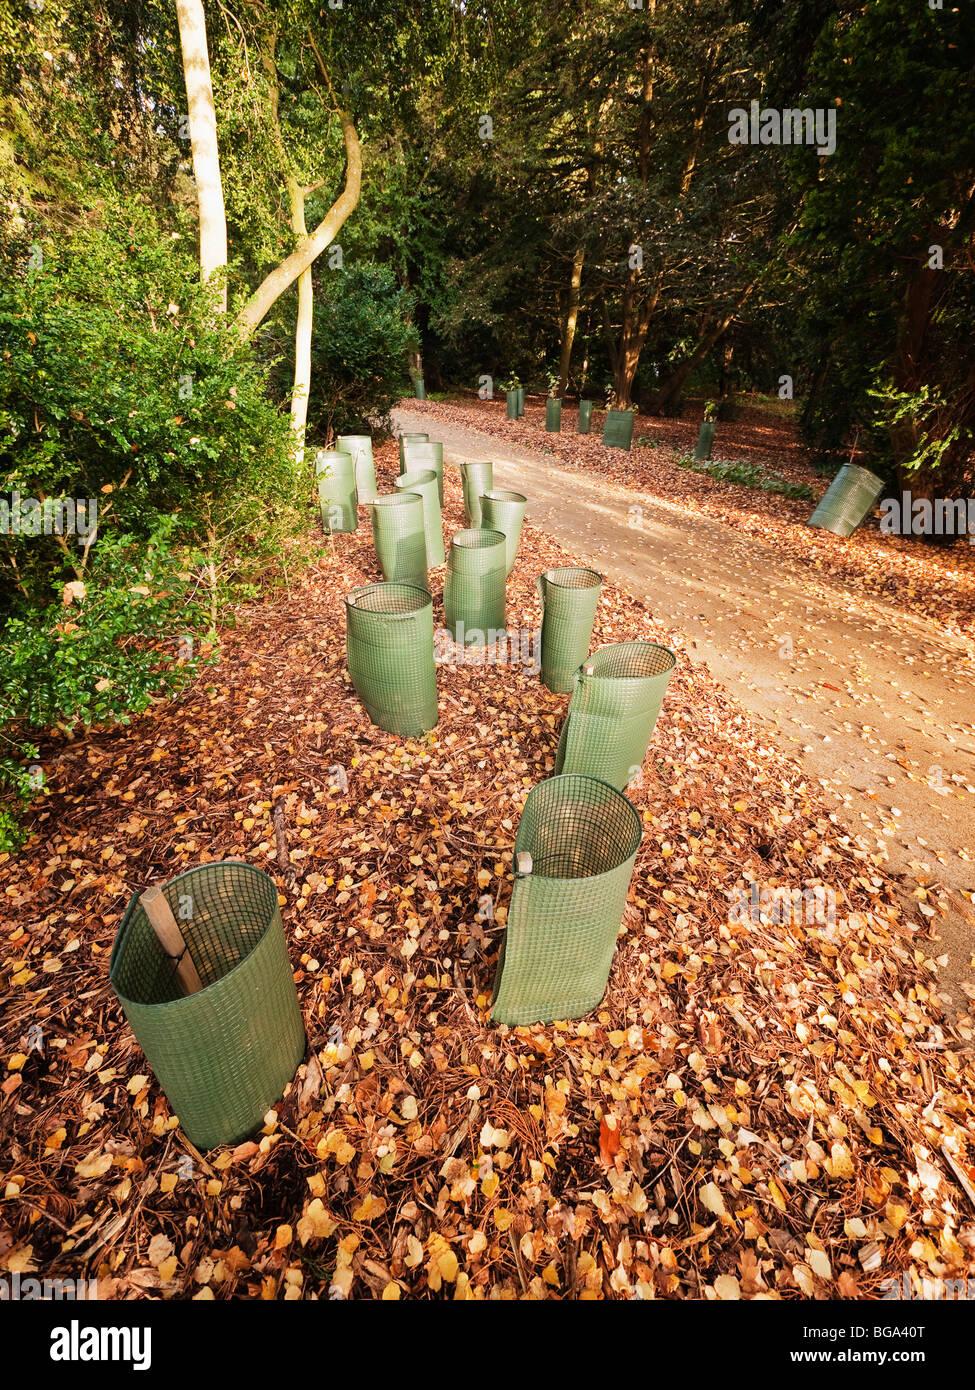 Nursery Garden Way Stock Photos & Nursery Garden Way Stock Images ...